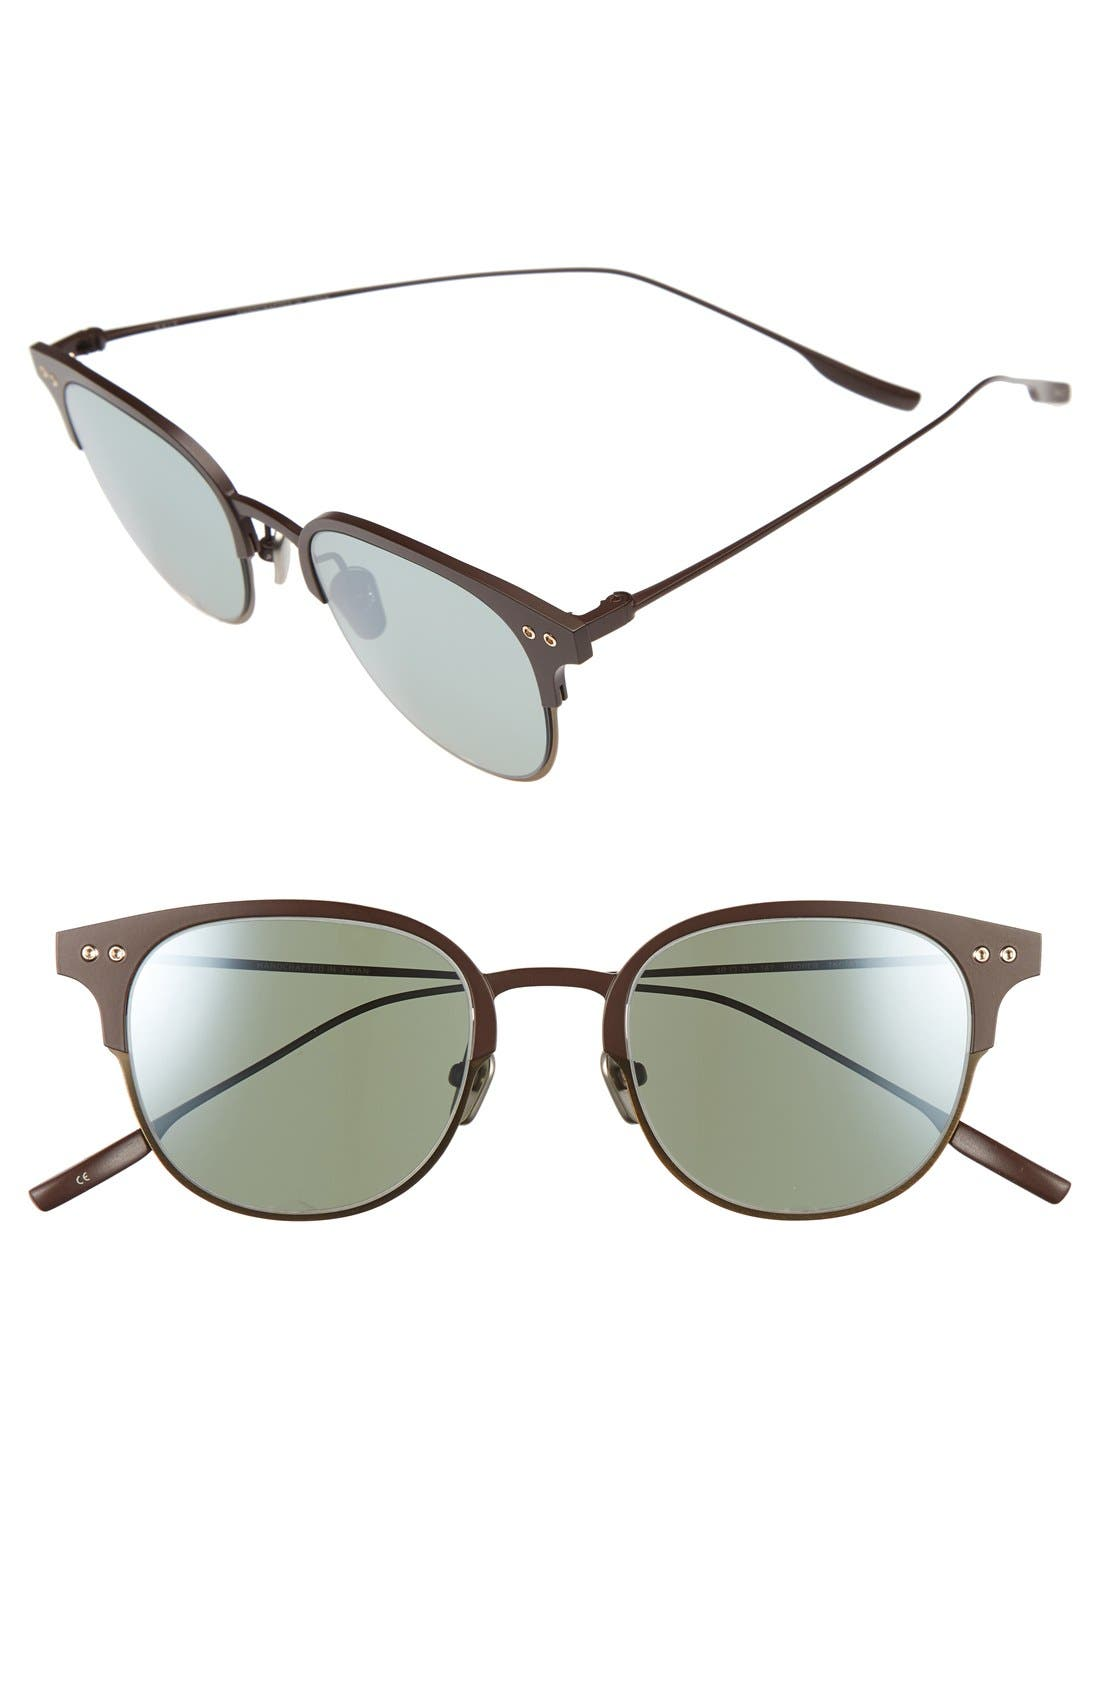 Hooper 48mm Polarized Sunglasses,                         Main,                         color, 220